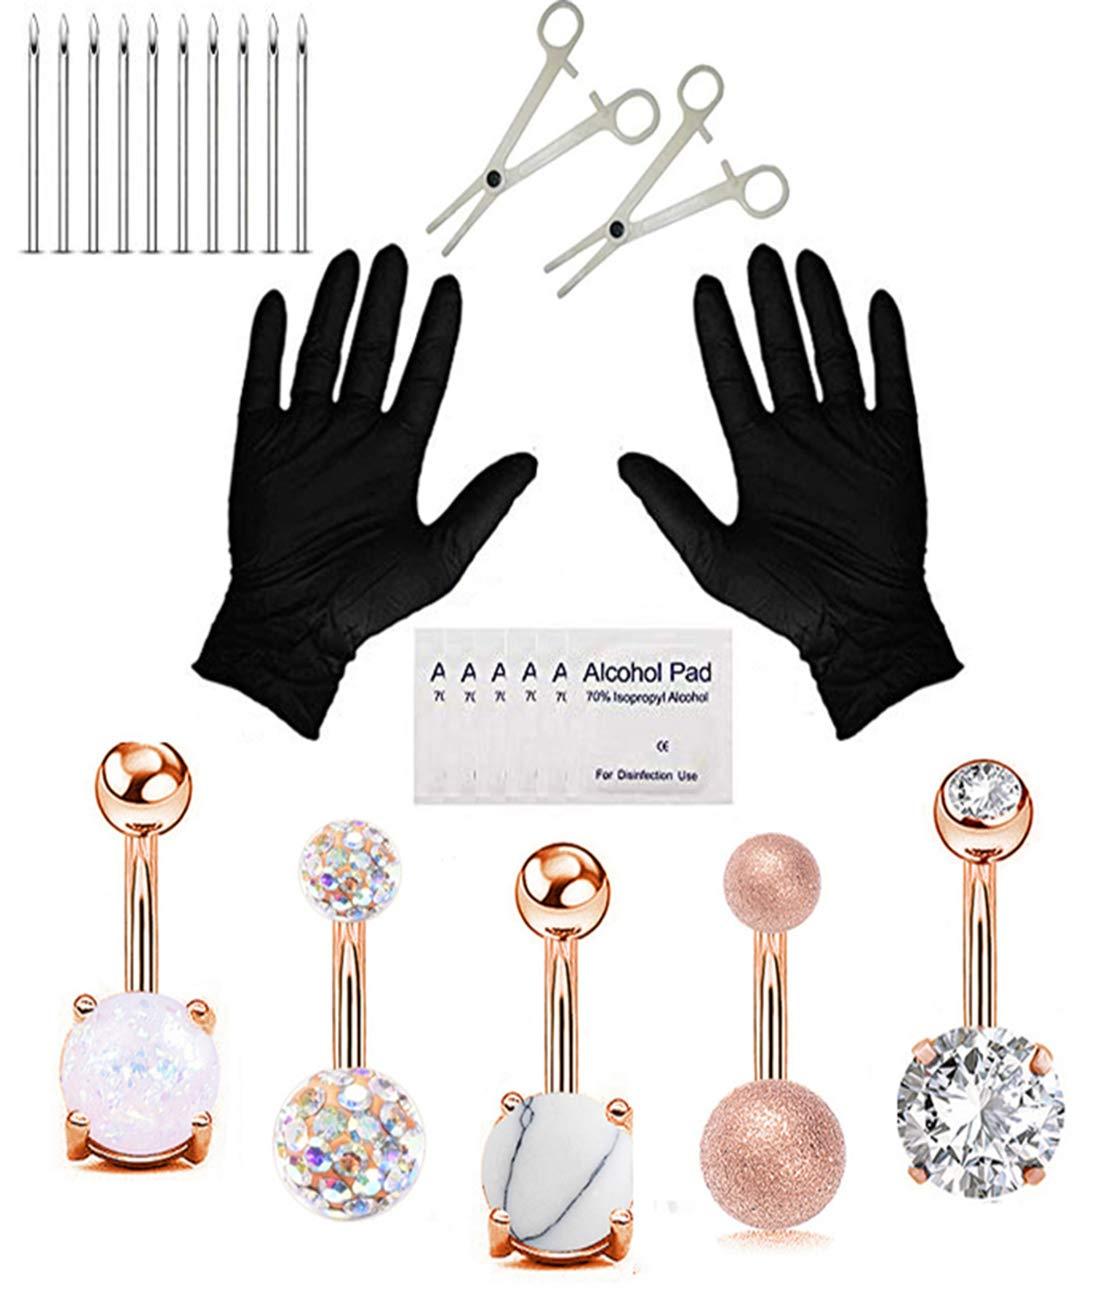 20Pcs Professional Piercing Kit Multicolor Steel 14G CZ Belly Navel Ring Body Piercing Needles Set Piercing Tool Supplies